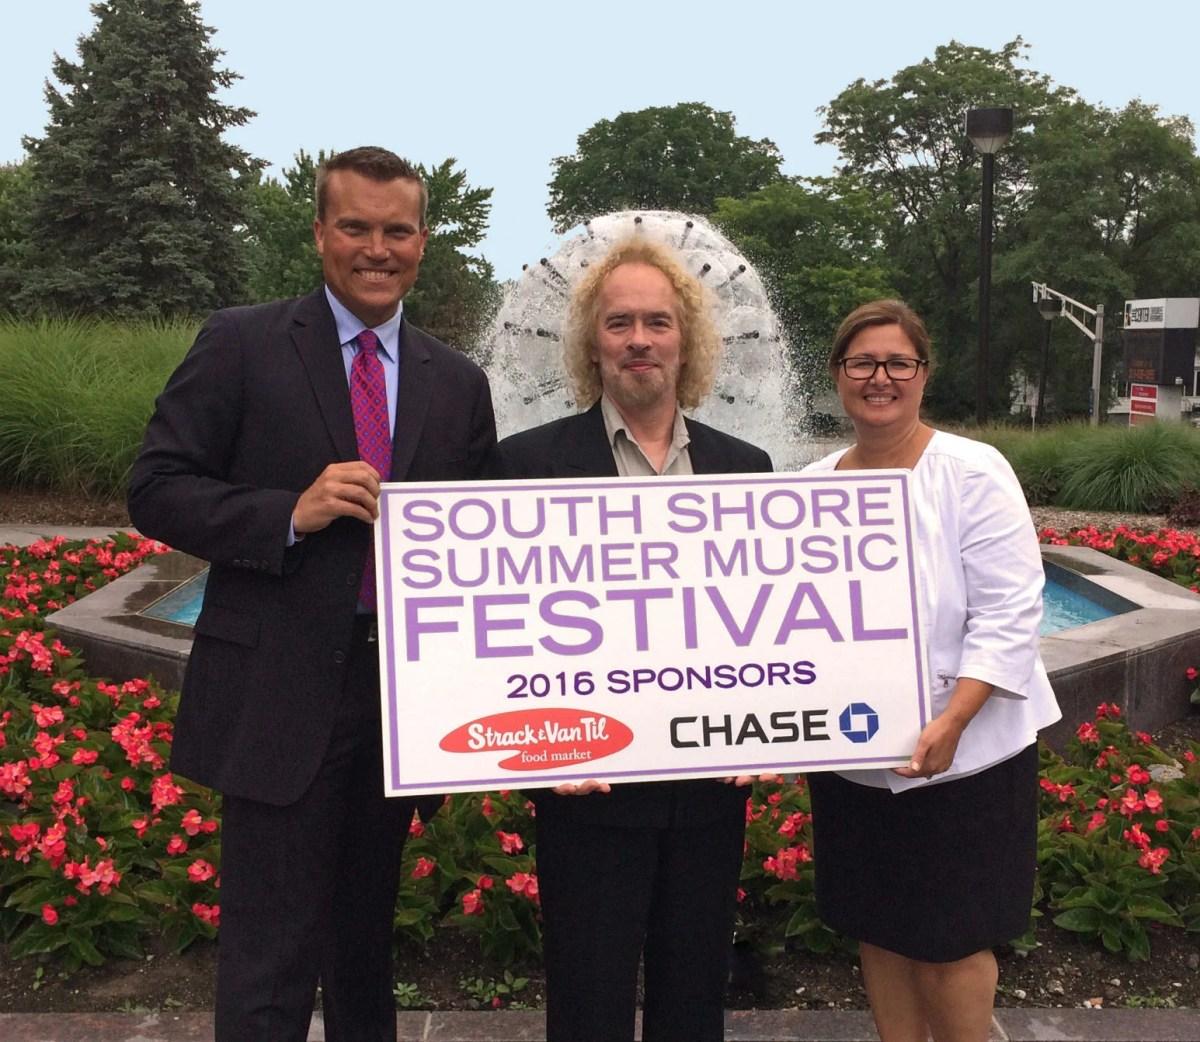 South Shore Summer Music Festival kicks off July 23 | Lake ...